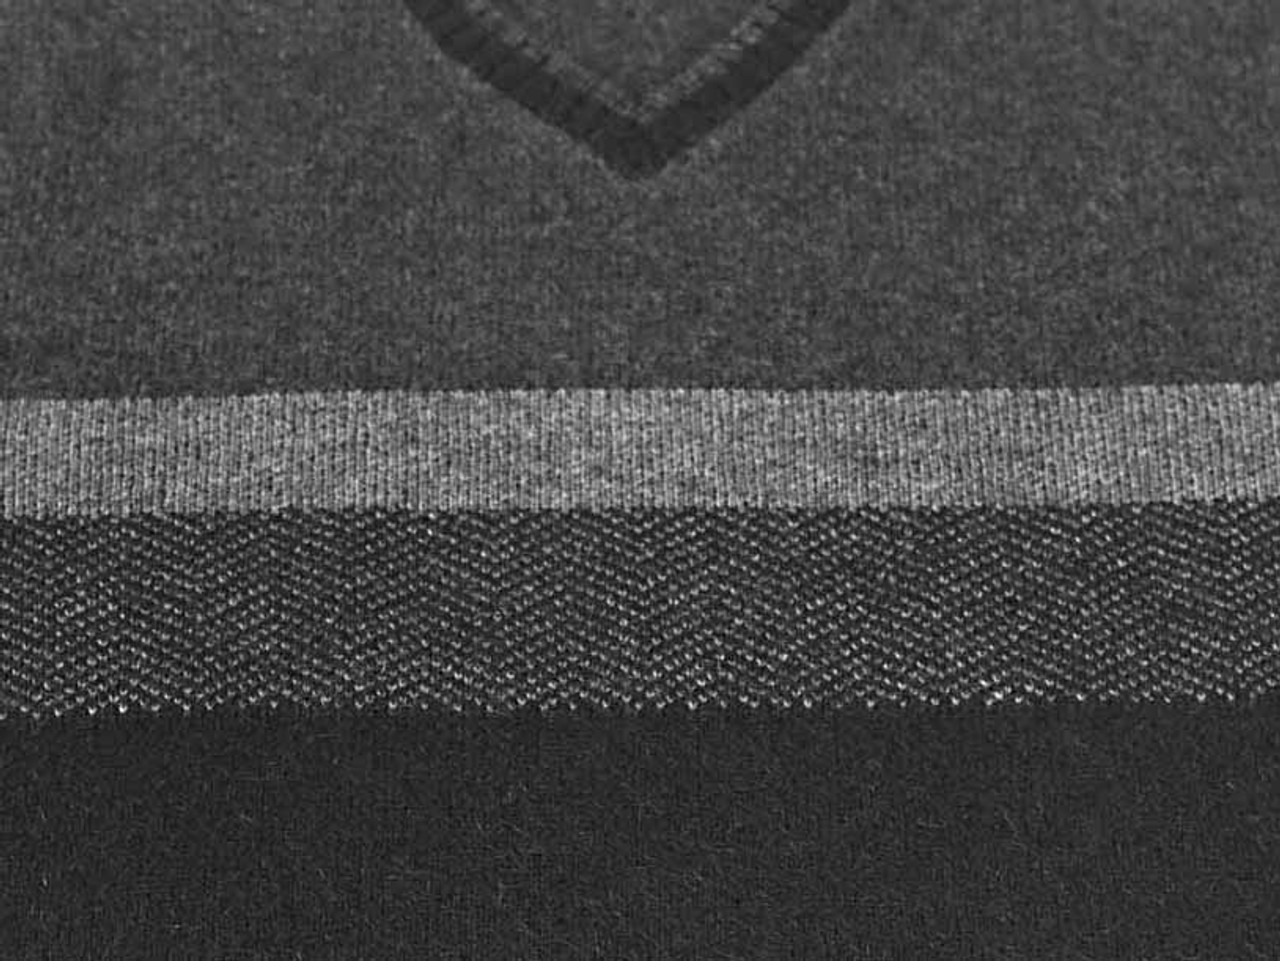 Swatch - Black / Grey / Charcoal